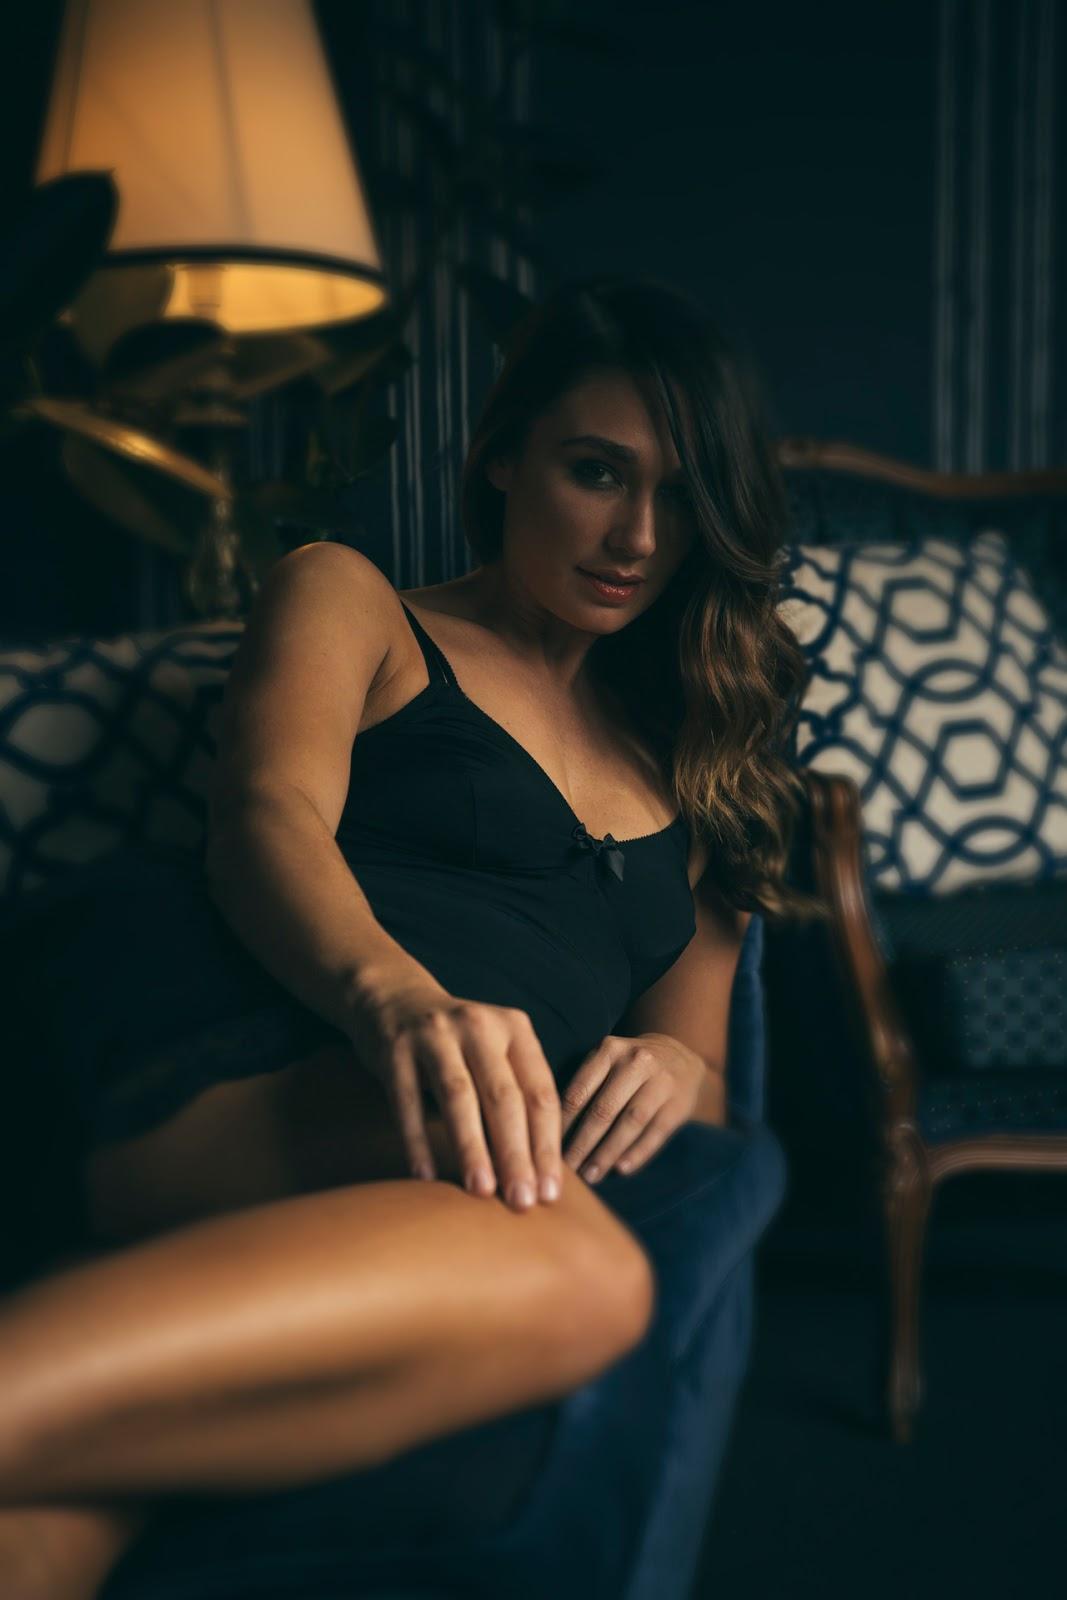 Hot Monika Radulovic nude (17 foto and video), Ass, Leaked, Selfie, cleavage 2015